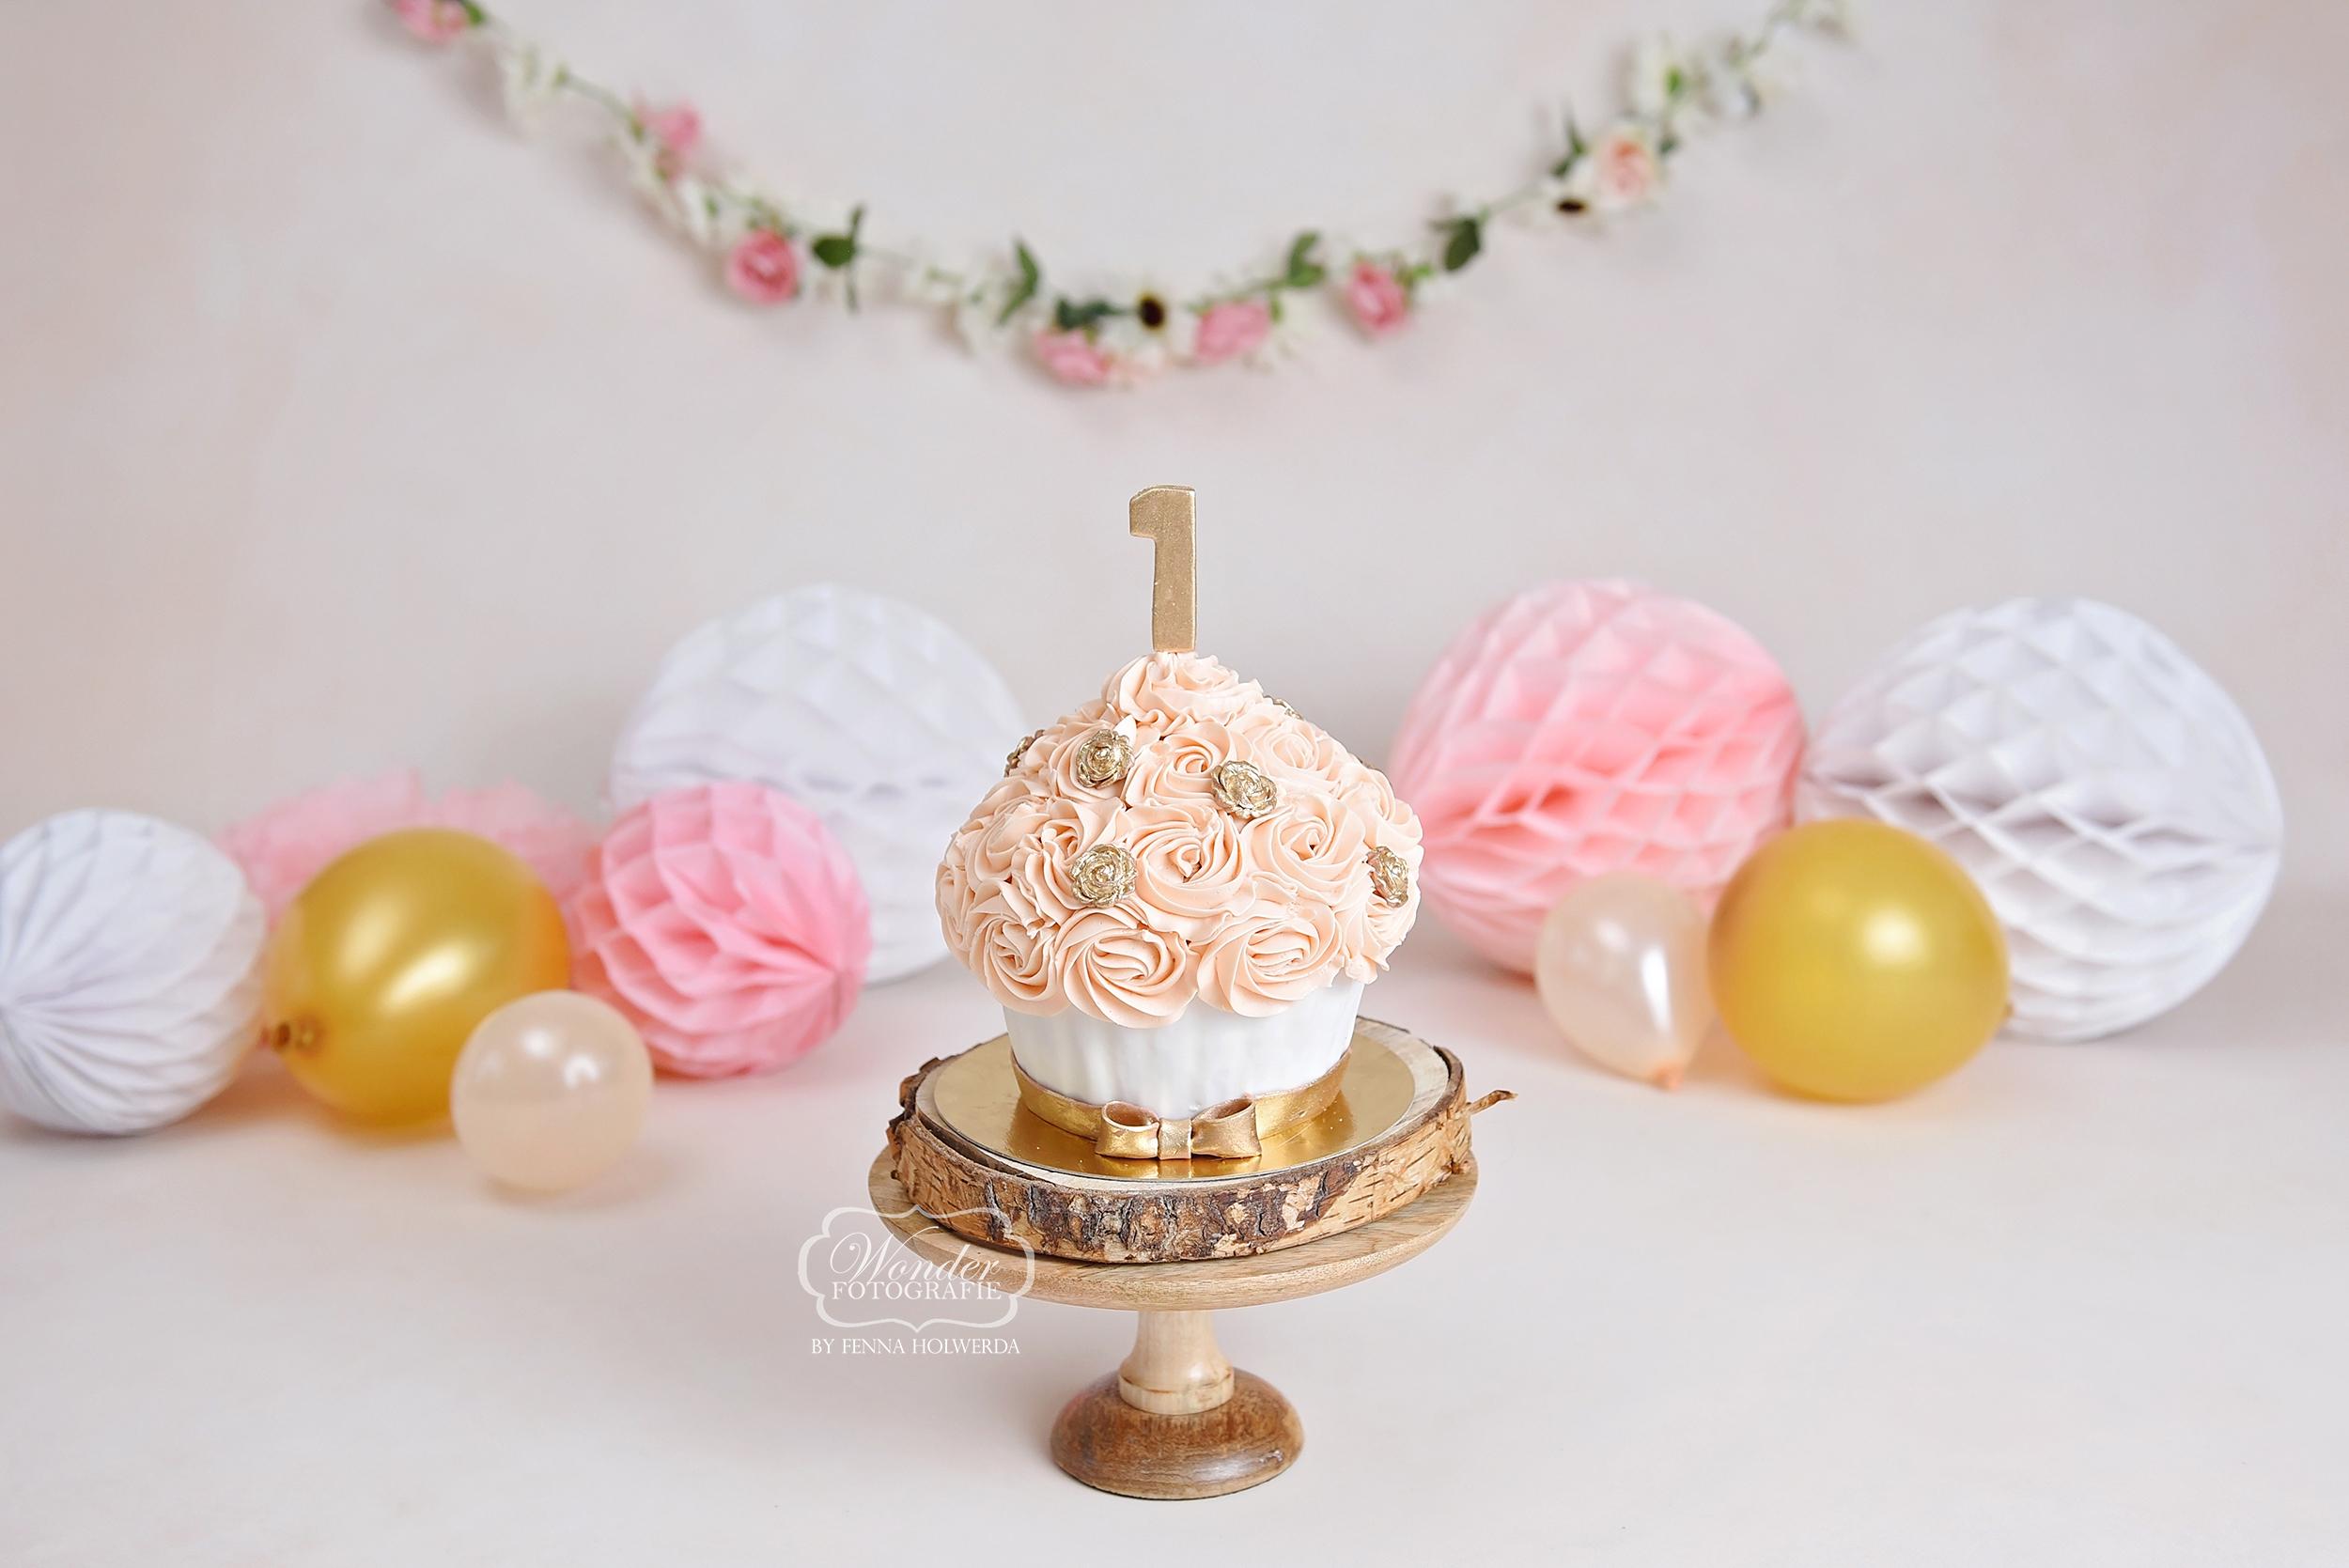 giant cupcake zalm goud roosjes cake smash fotoshoot